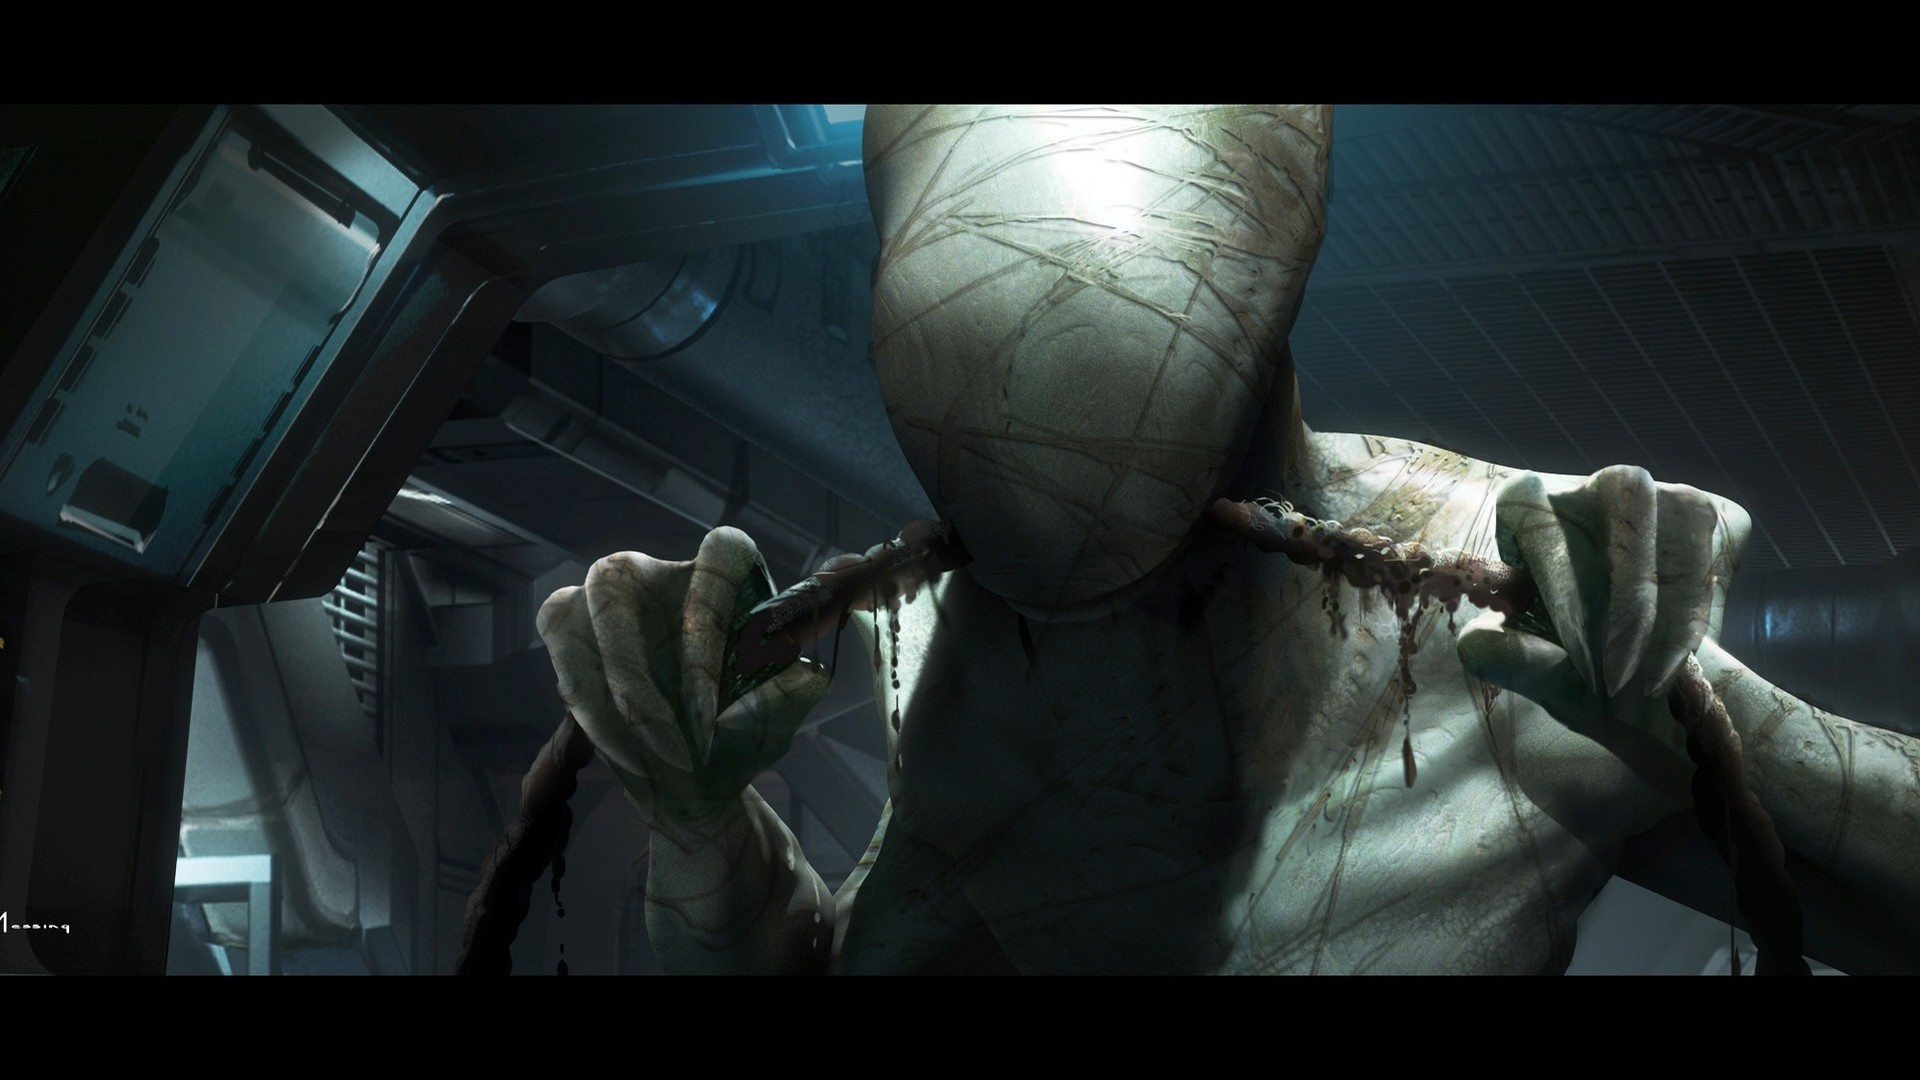 Alien Drawing Monster Creepy Horror Sci-fi Dark Wallpaper At Dark Wallpapers